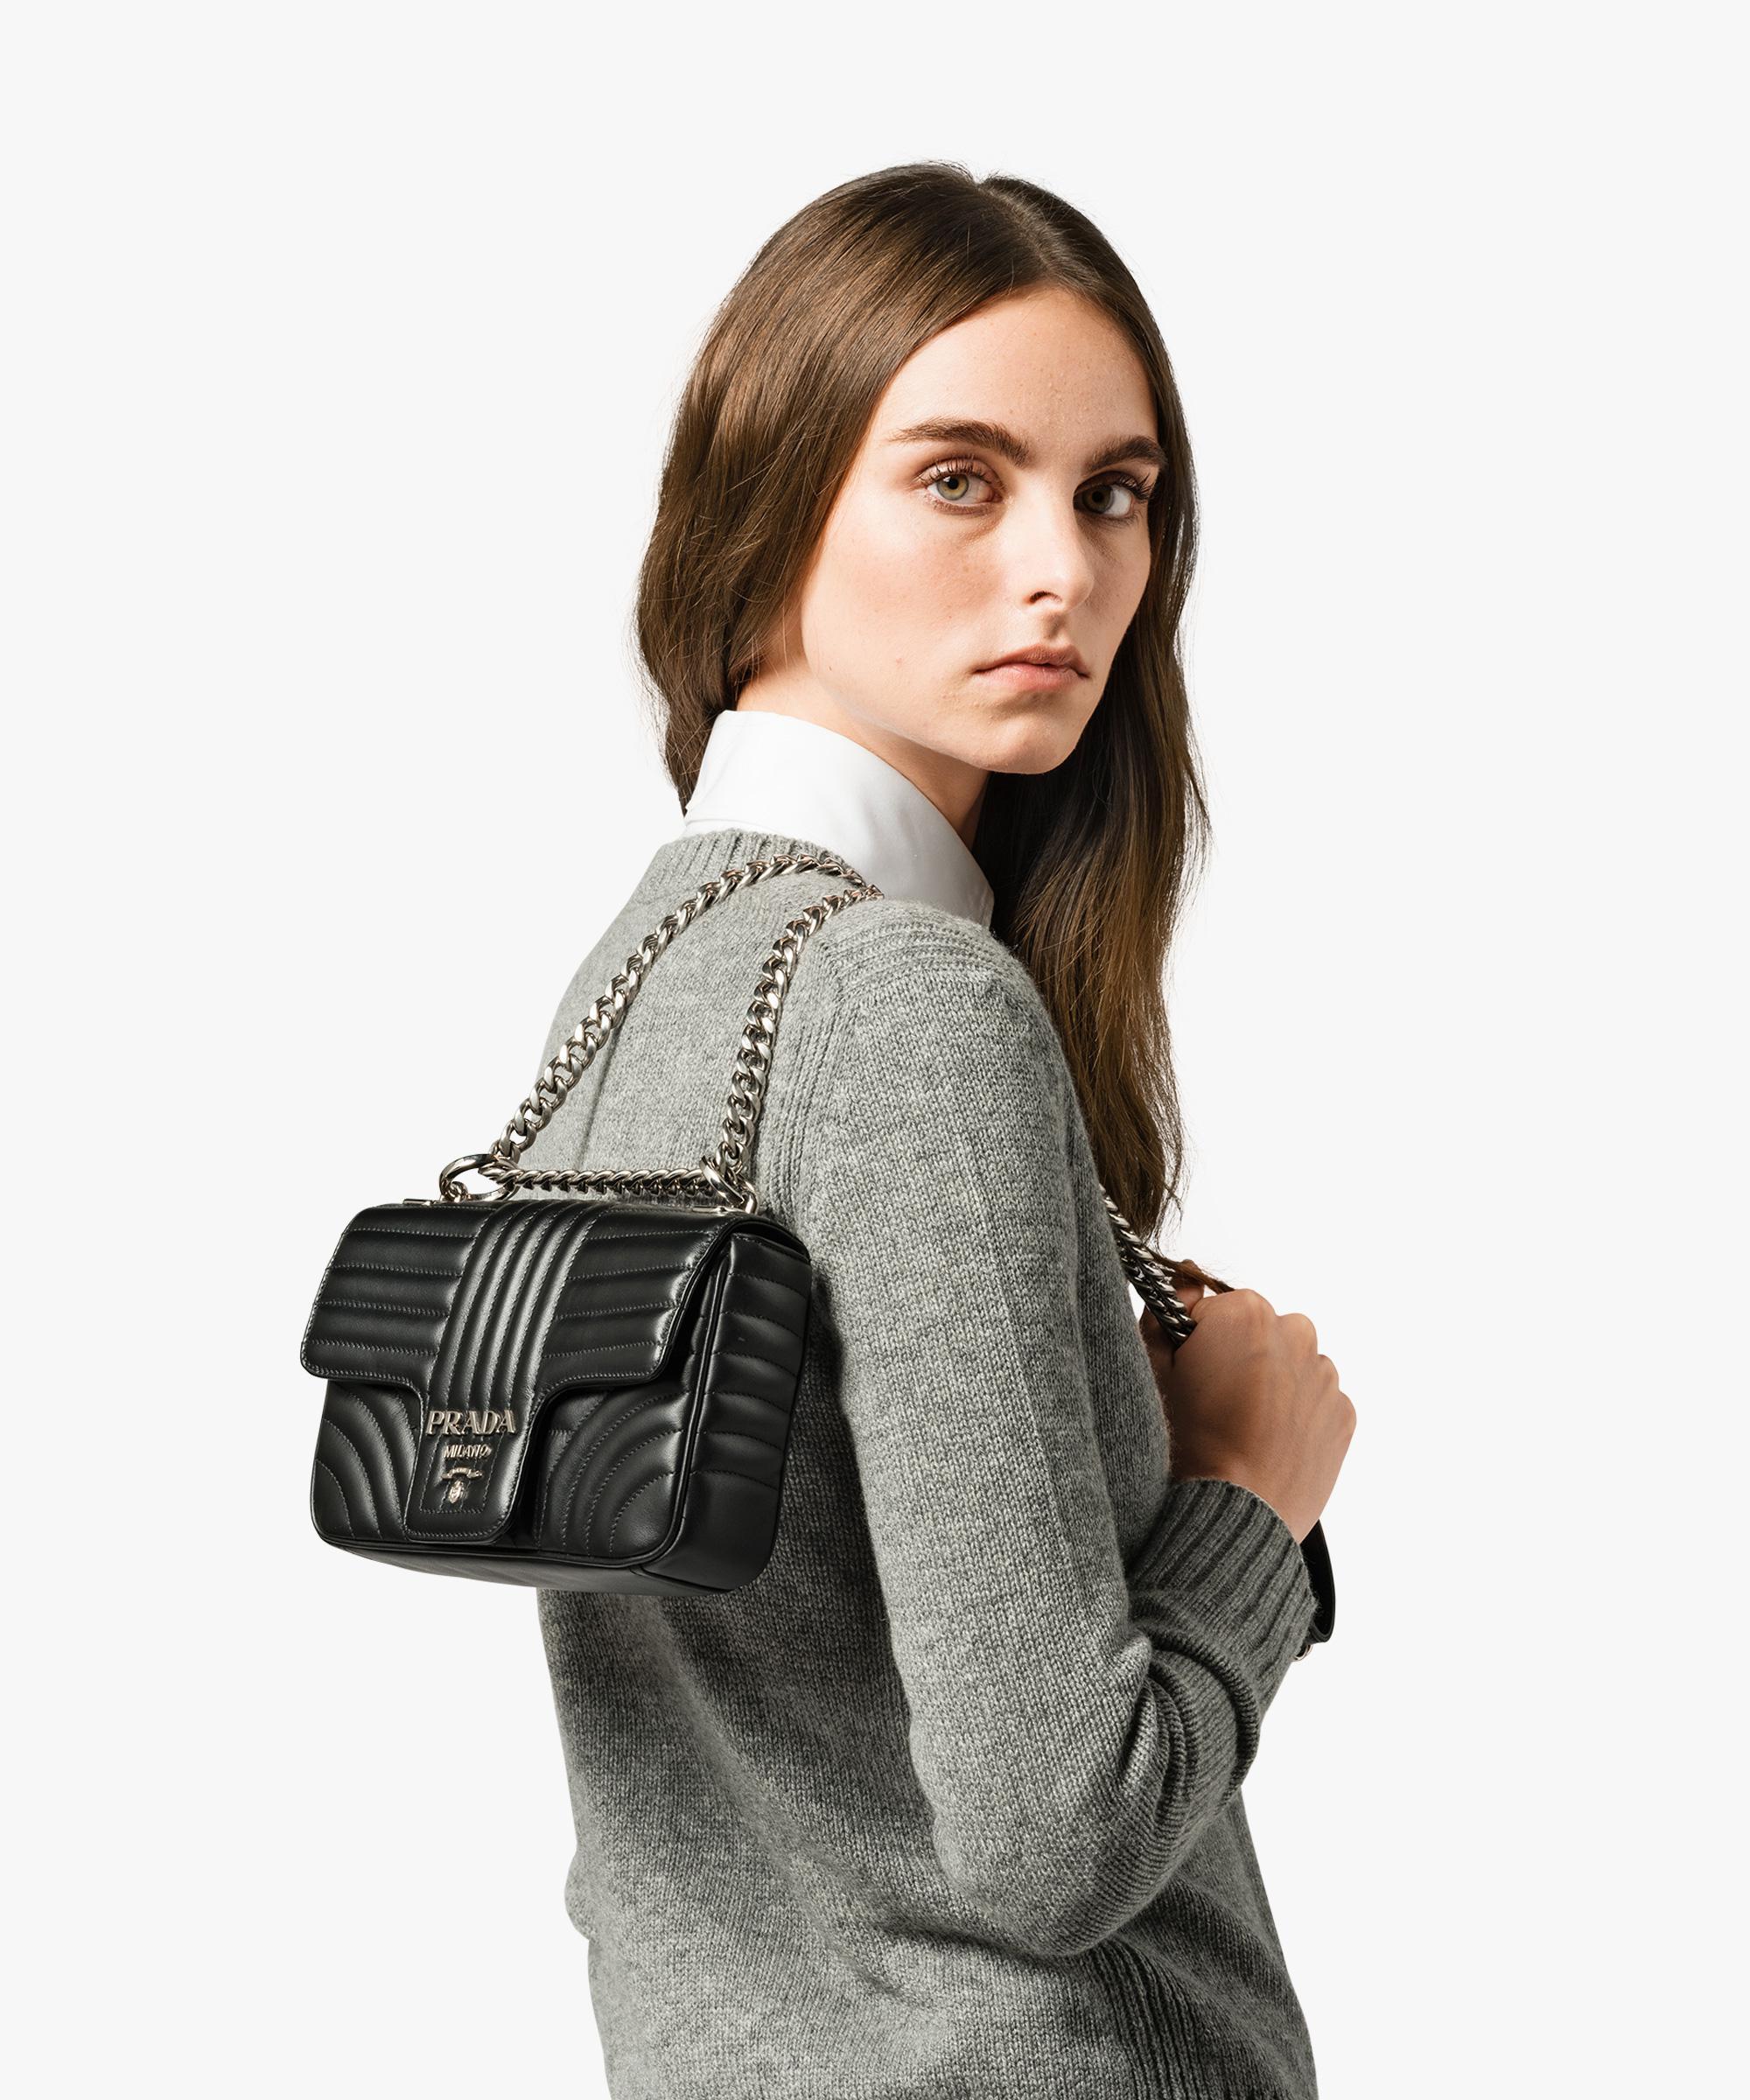 0e8df138c9f4 Lyst - Prada Diagramme Leather Shoulder Bag in Black